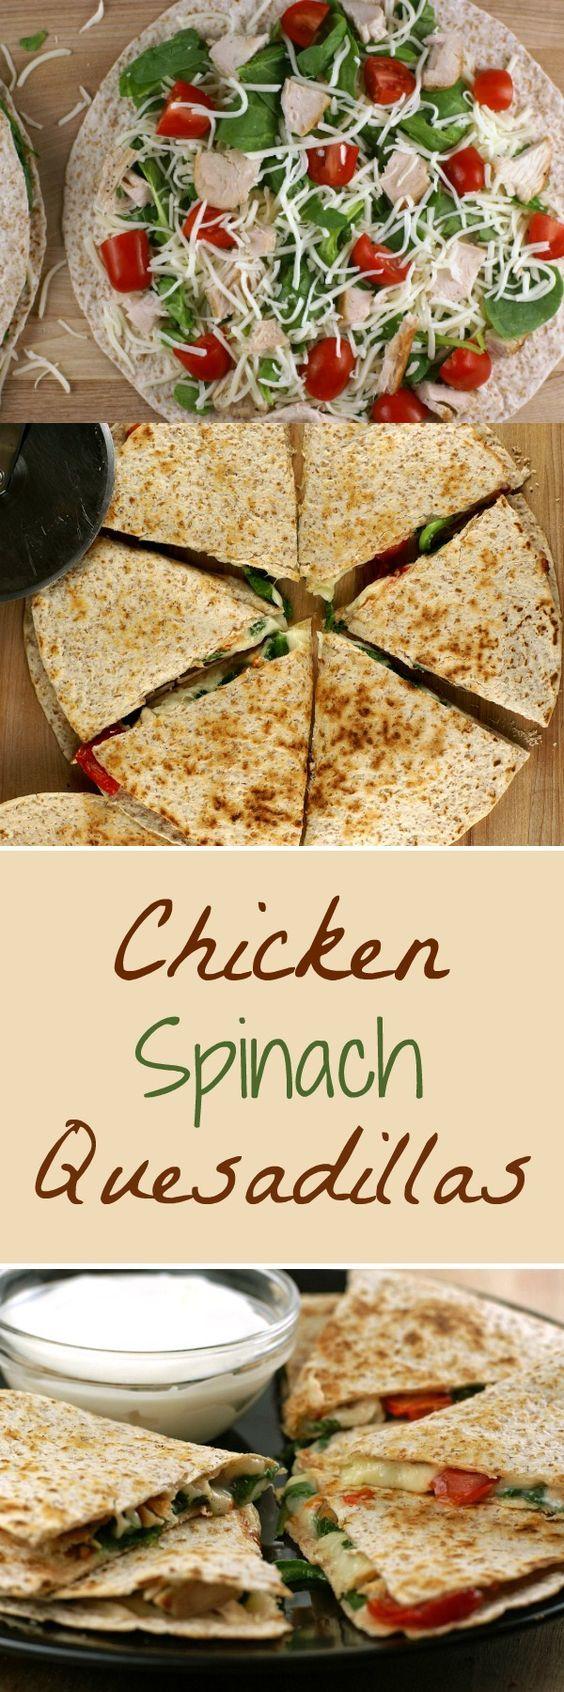 Chicken and Spinach Quesadillas   5DollarDinners.com